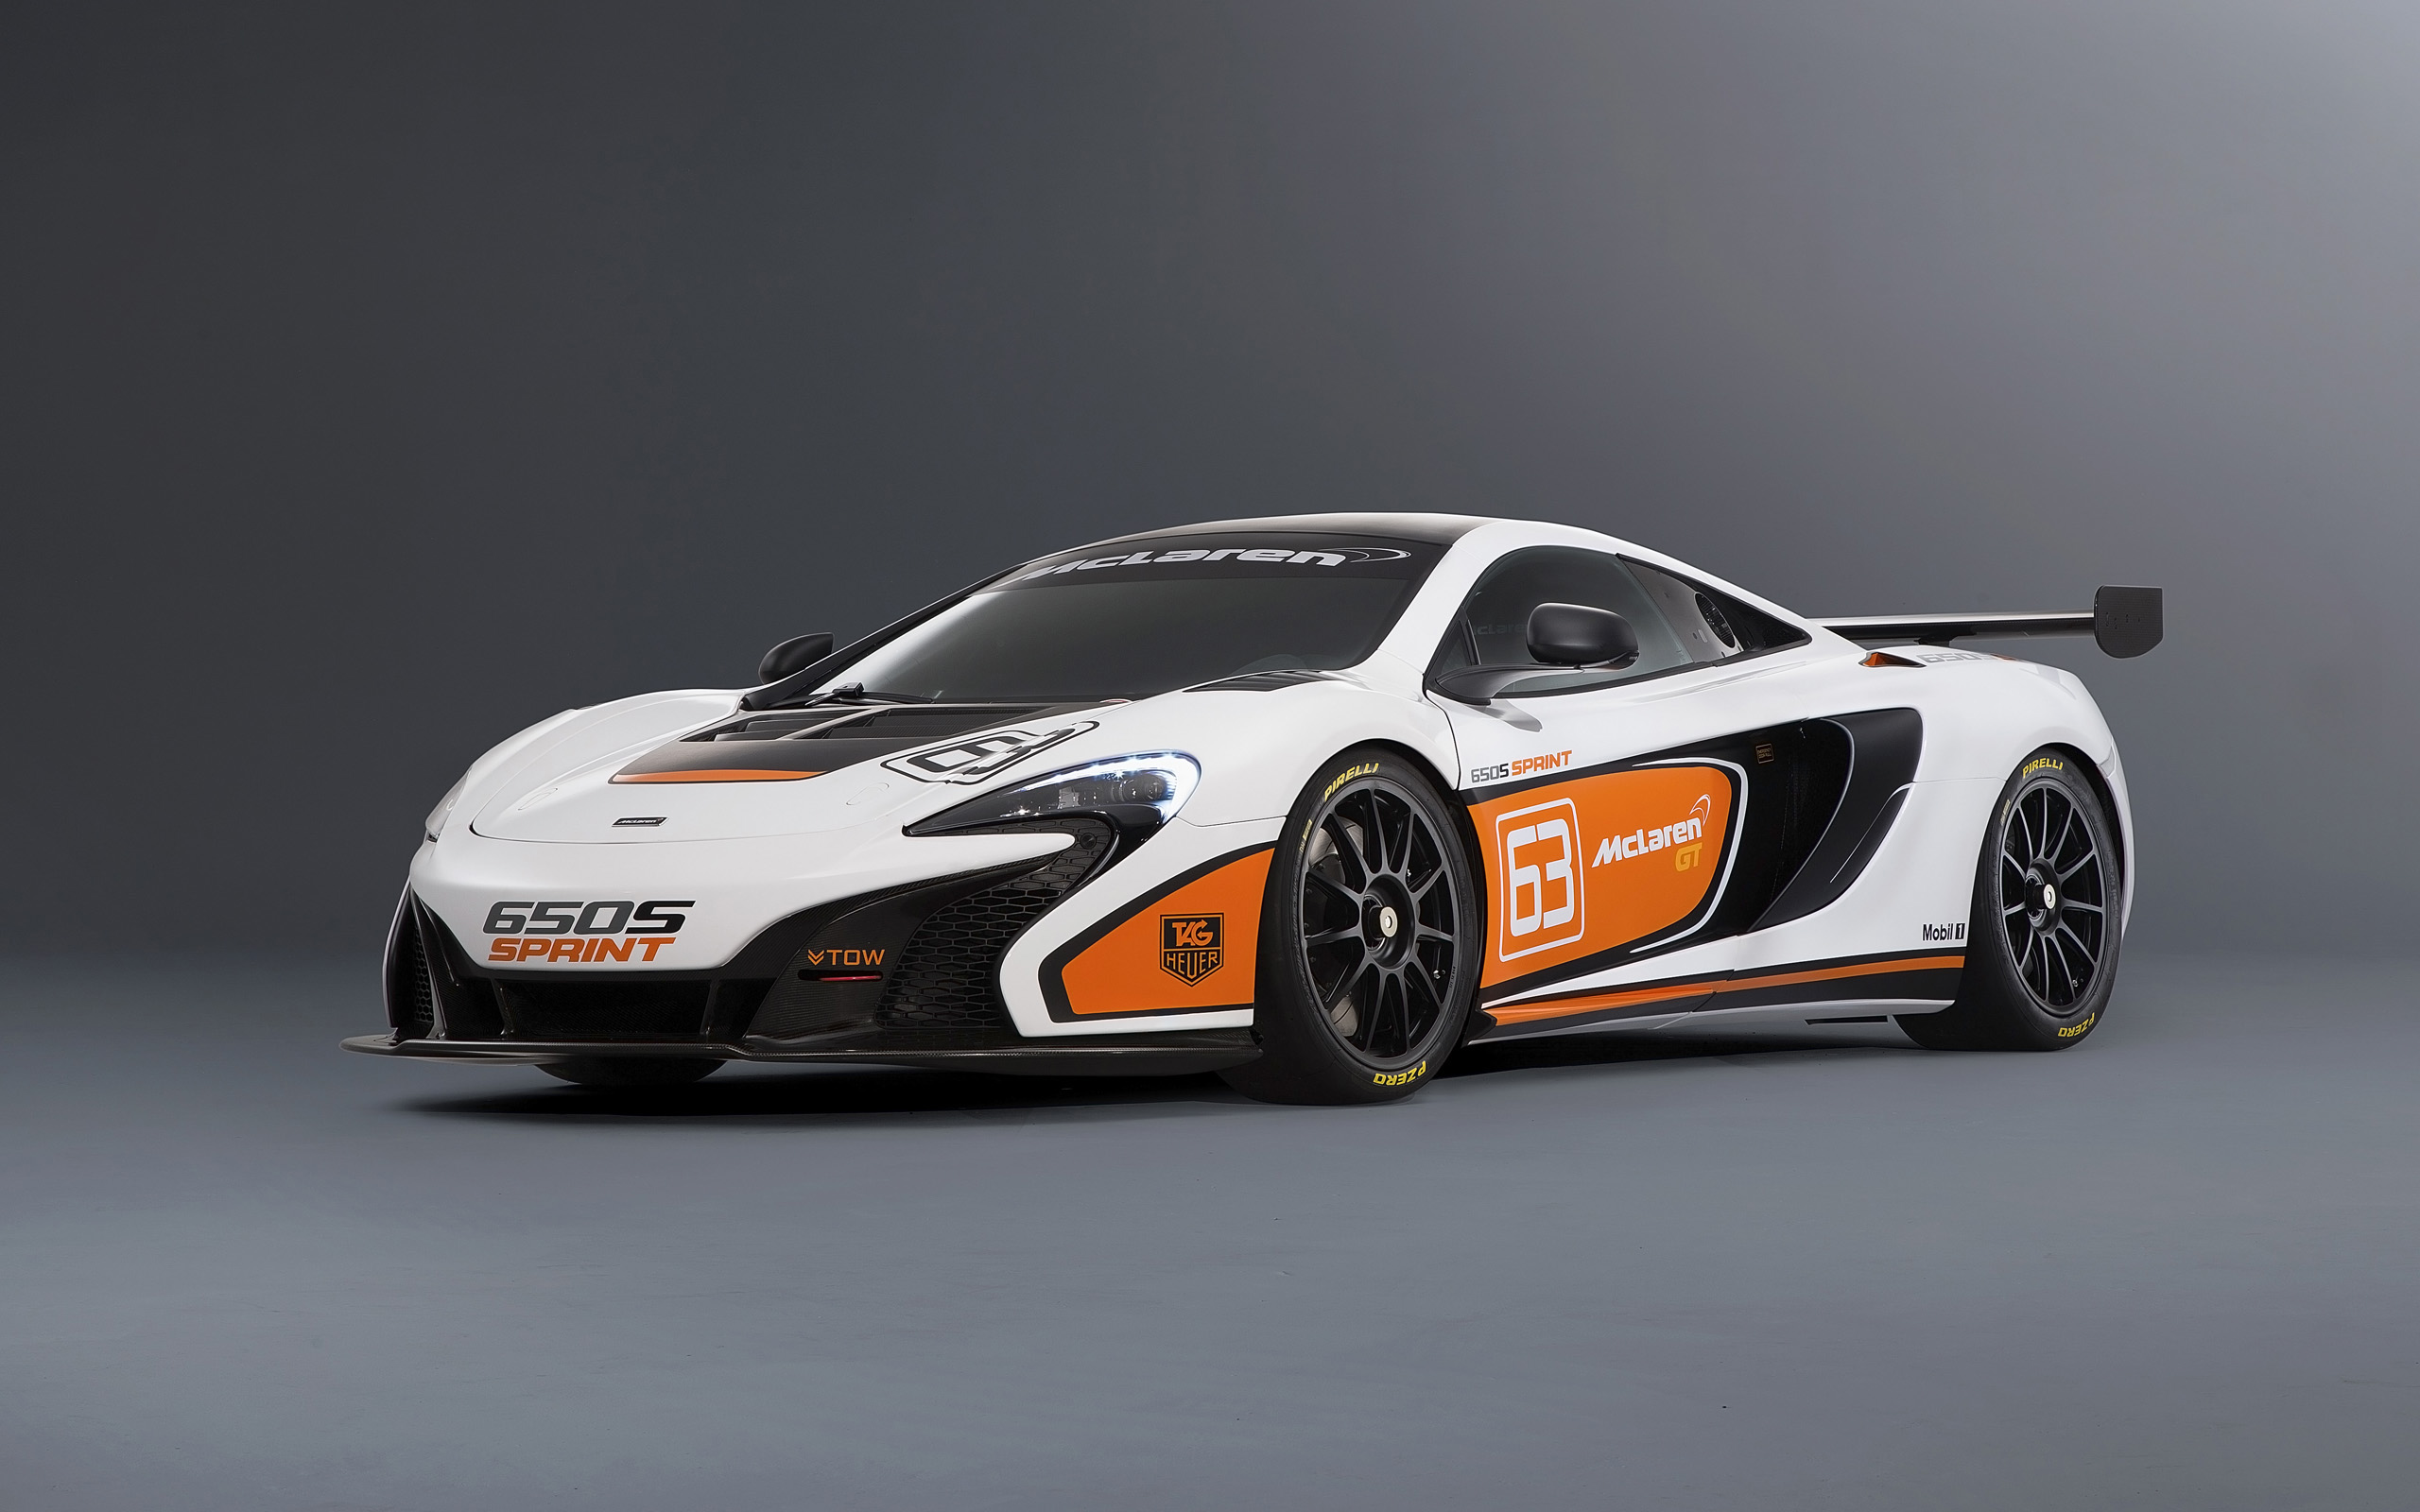 Mini Cup Race Car >> 2015 McLaren 650S Sprint Wallpaper | HD Car Wallpapers | ID #4709